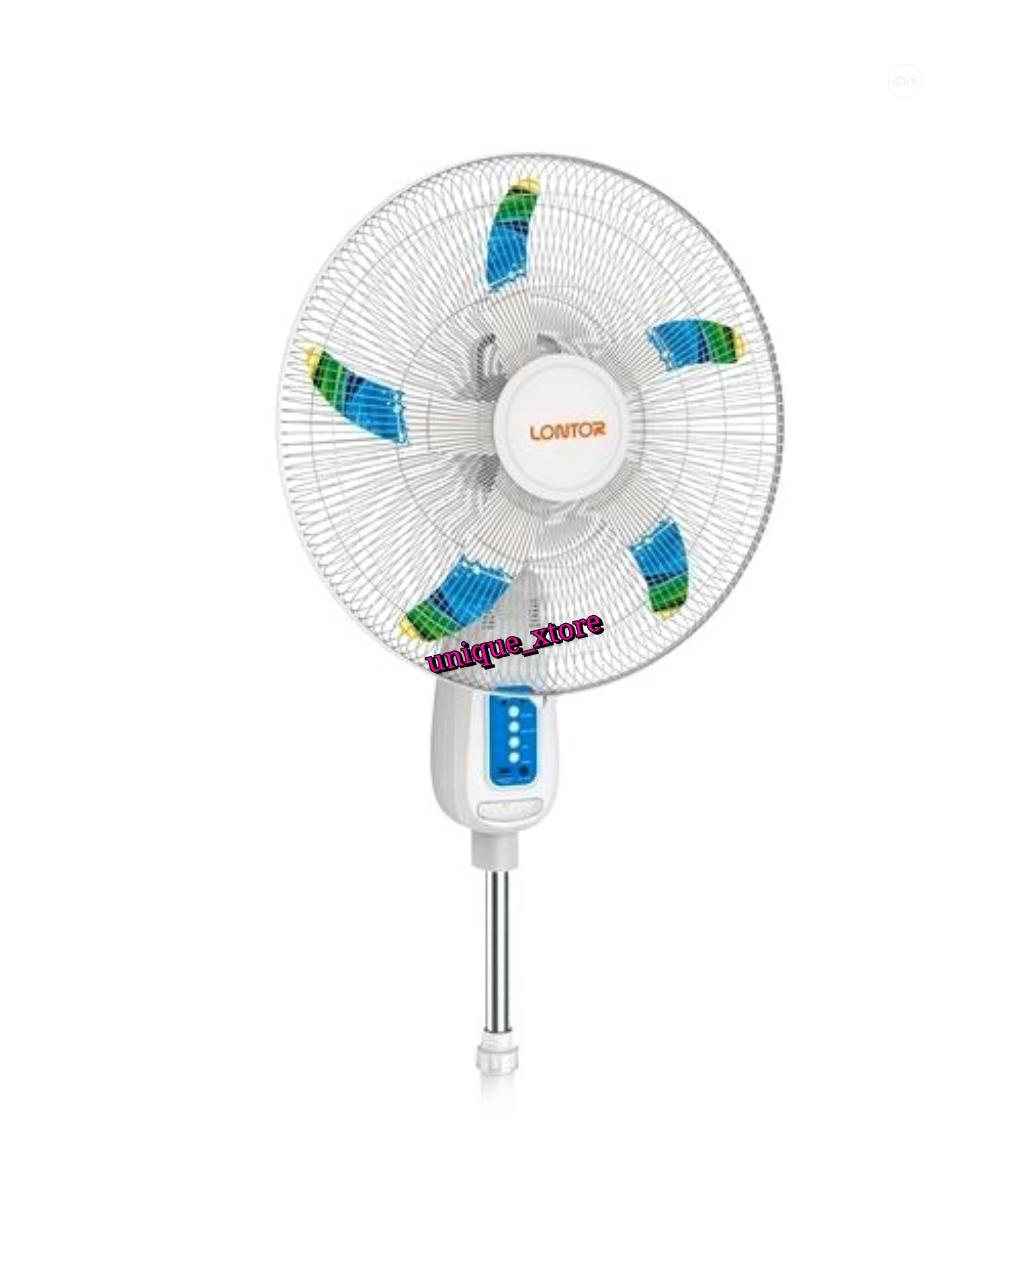 Lontor 18-inch Rechargeable Standing Fan - White